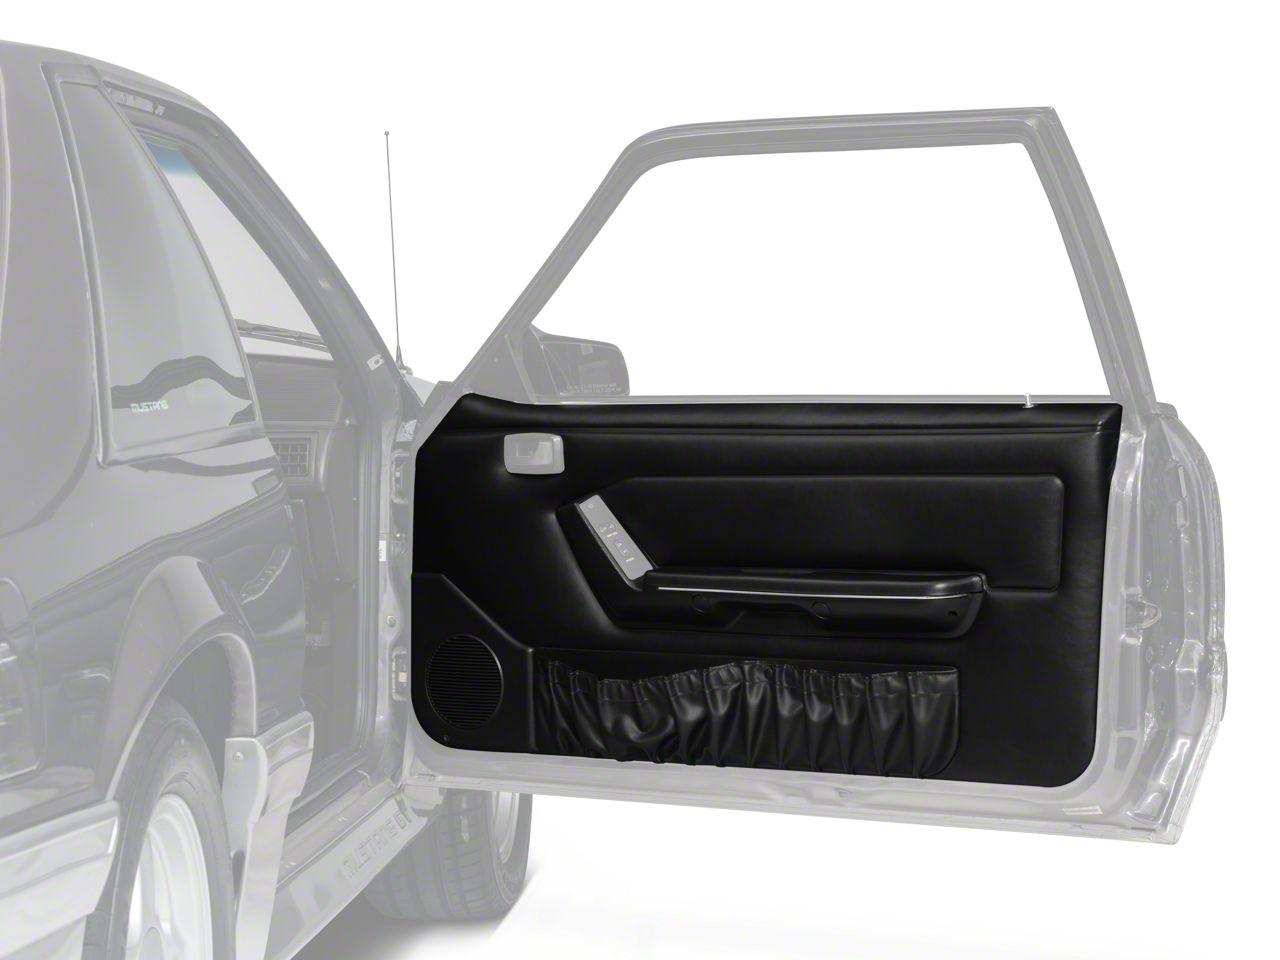 OPR Door Panels w/ Power Windows & Map Pockets - Black (87-93 Coupe, Hatchback)